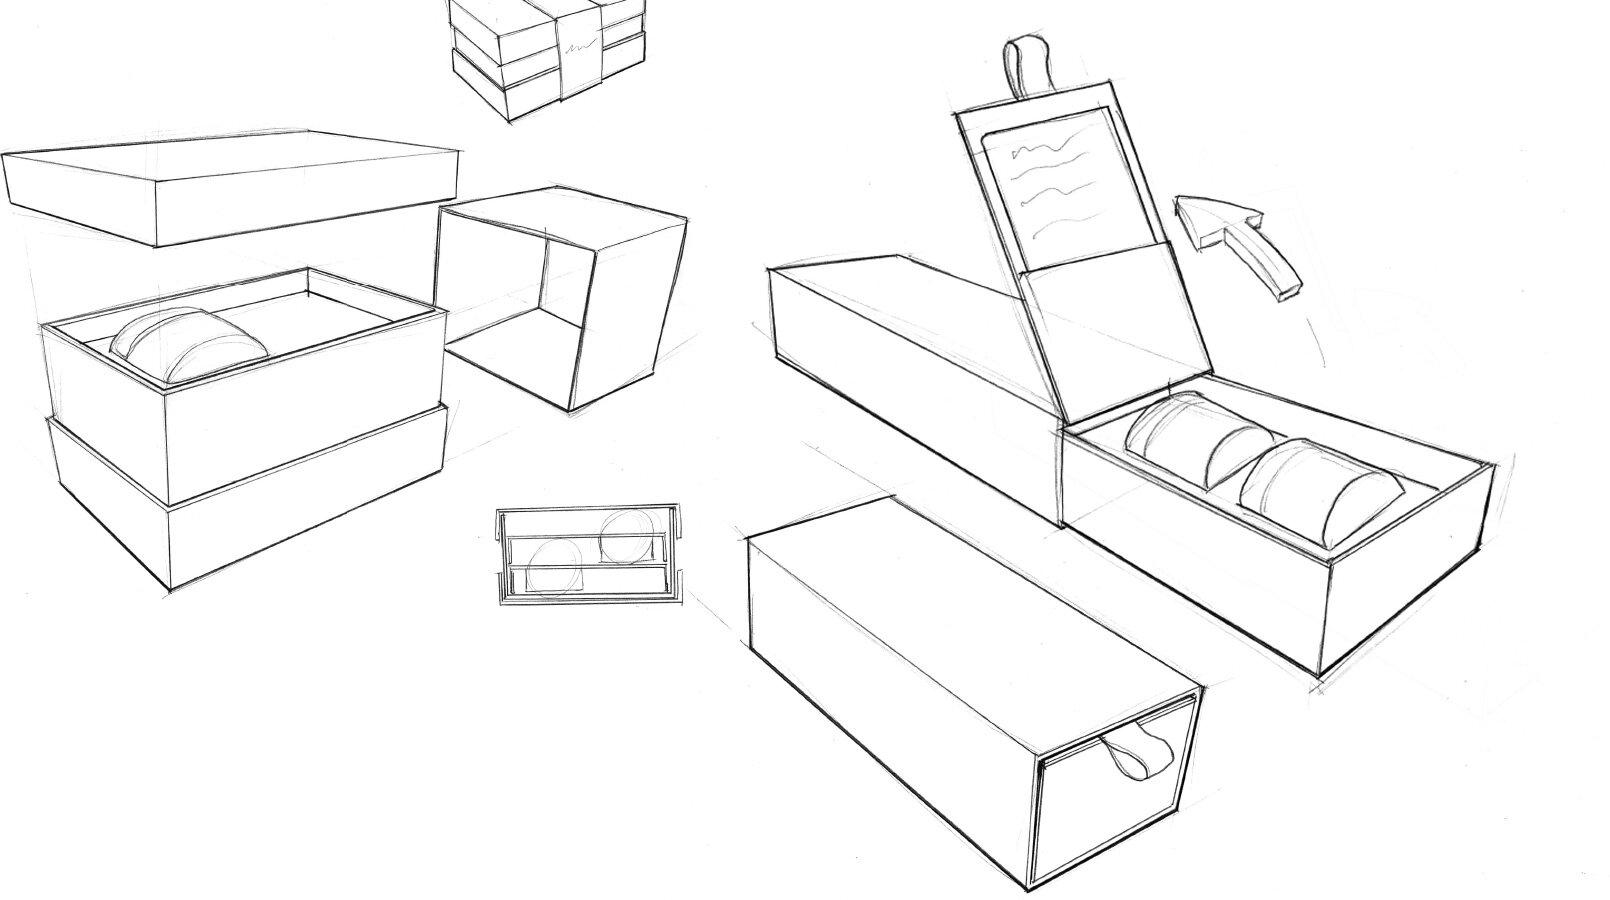 Nueverogena-Hydro-Boost-Box-化妆品包装公司 - 设计-1.jpg